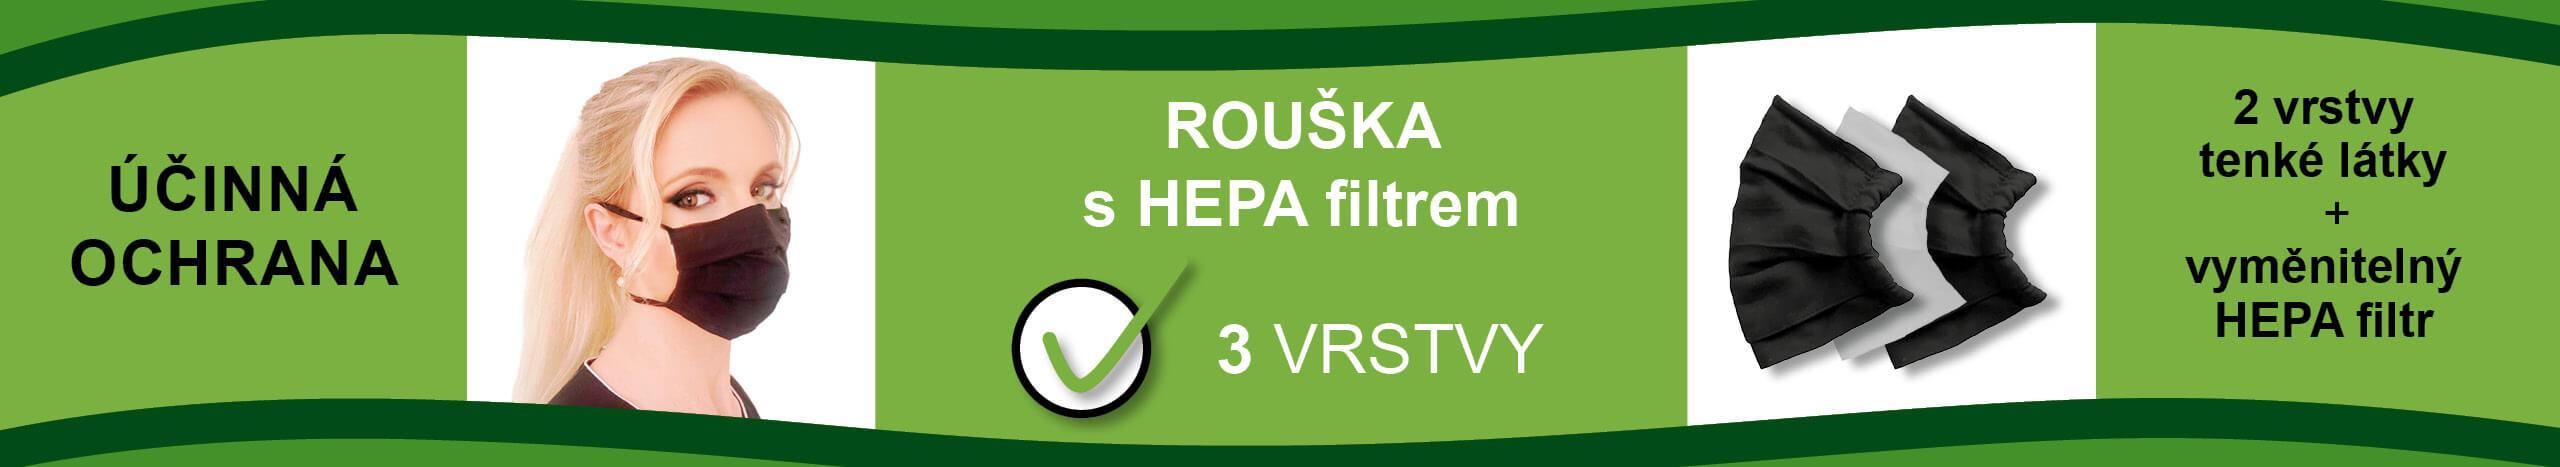 slide_pro_web_rouska_s_hepafiltrem_002